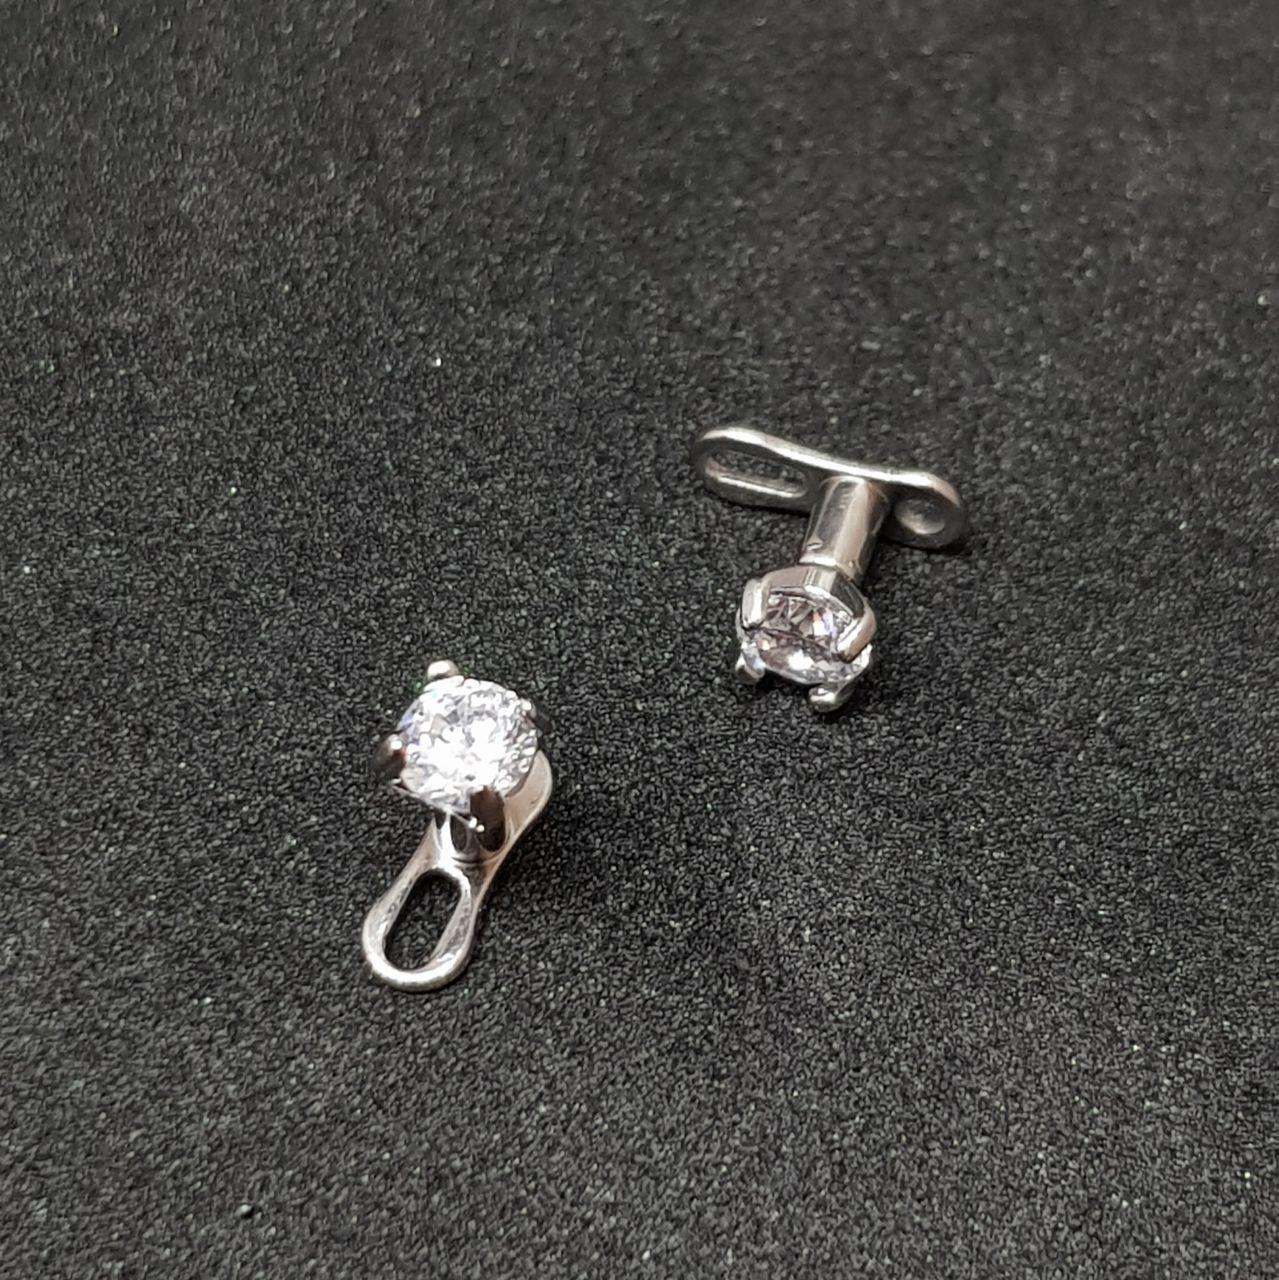 Микродермалы титановые с белым камнем (диаметр камня 3 мм)